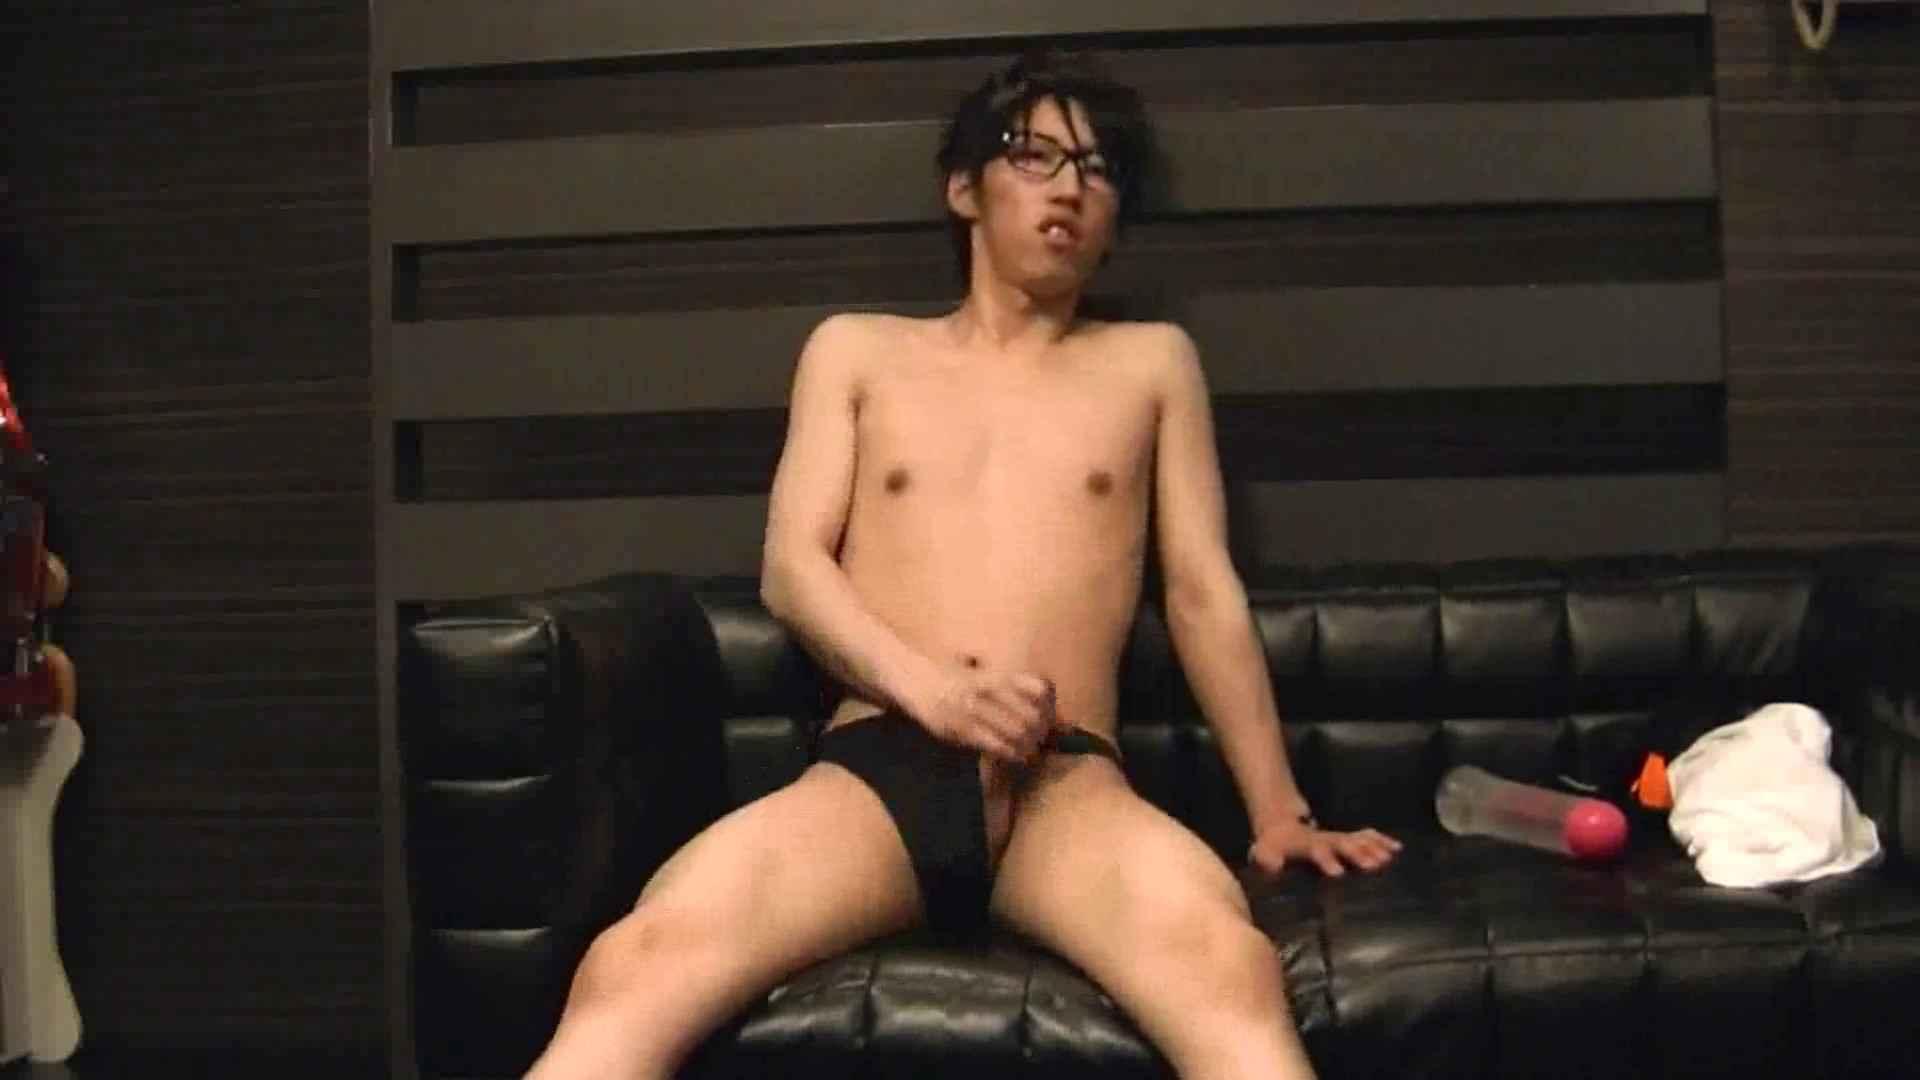 ONA見せカーニバル!! Vol3 男 ゲイ無料無修正画像 89枚 60